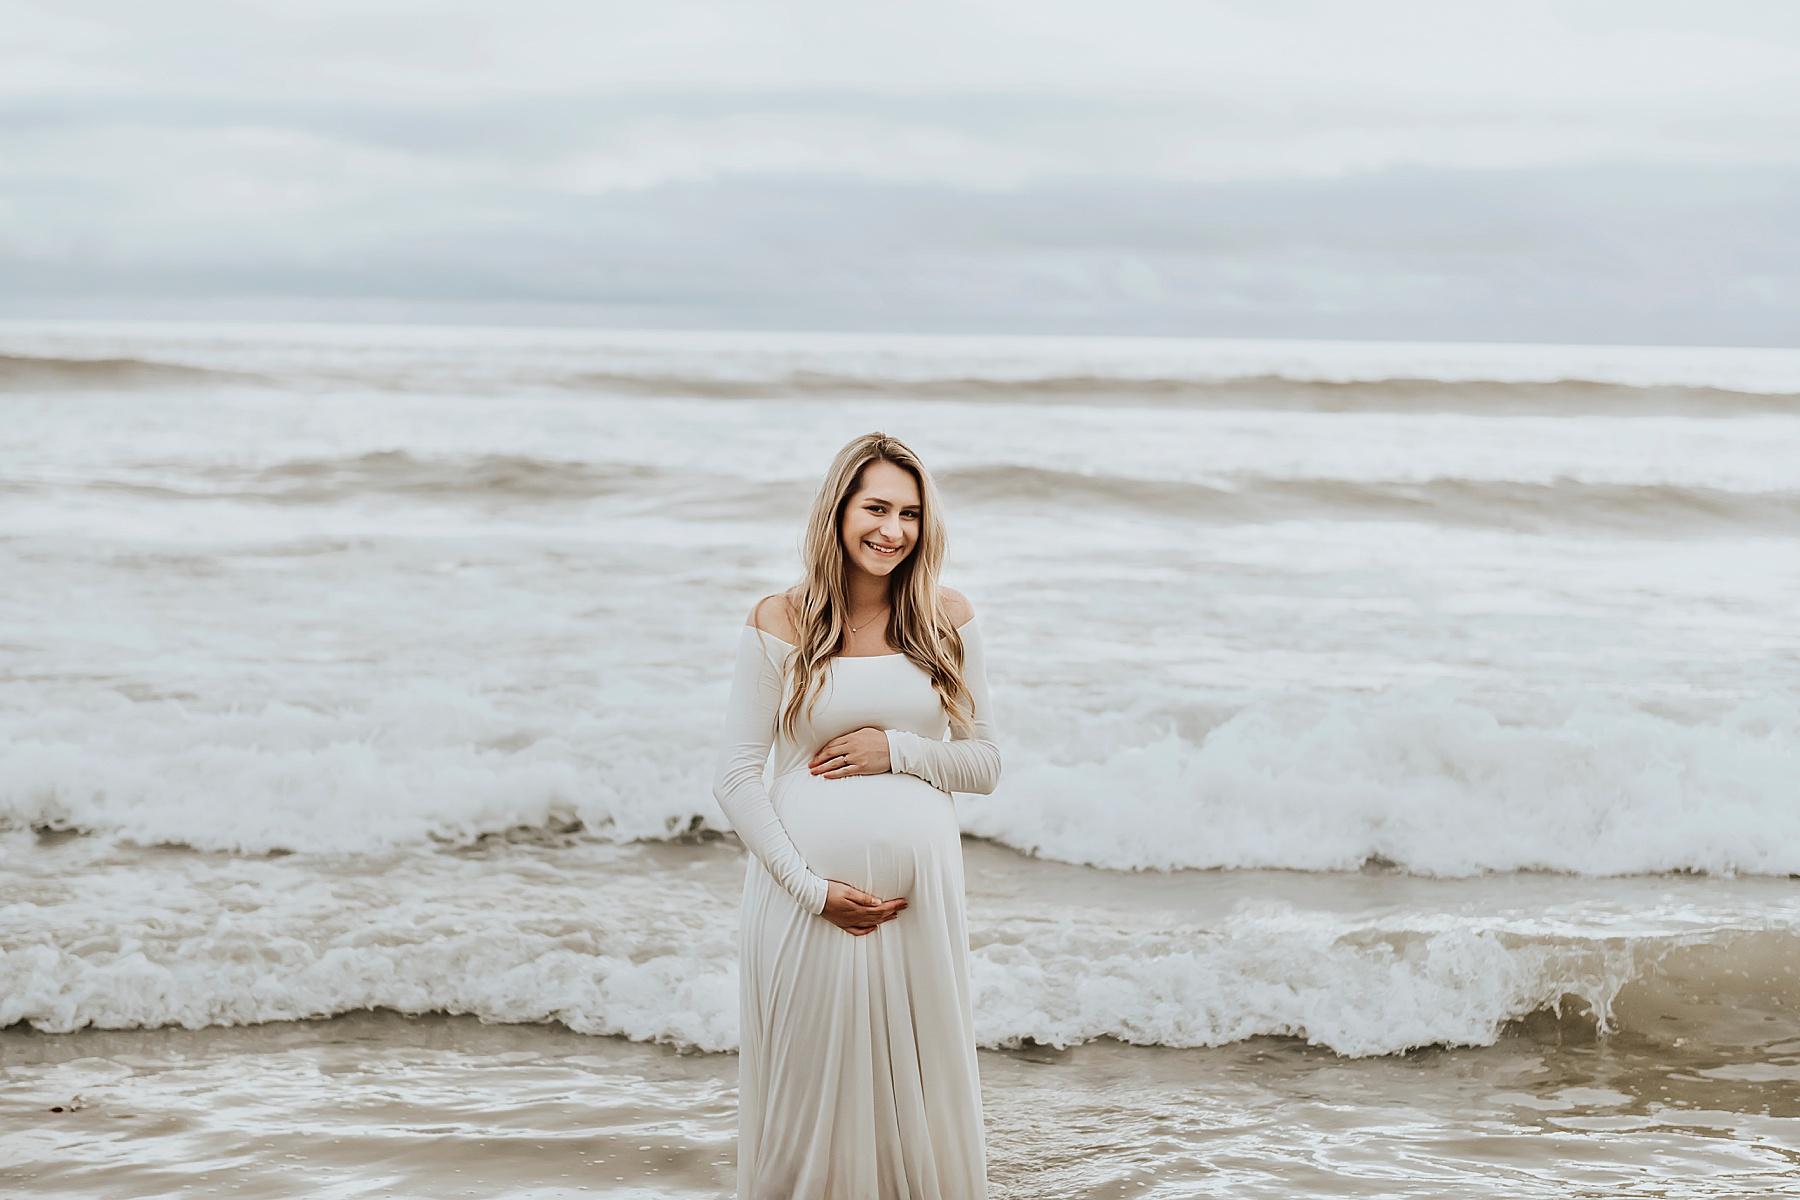 maternity photography del mar expecting mom on beach